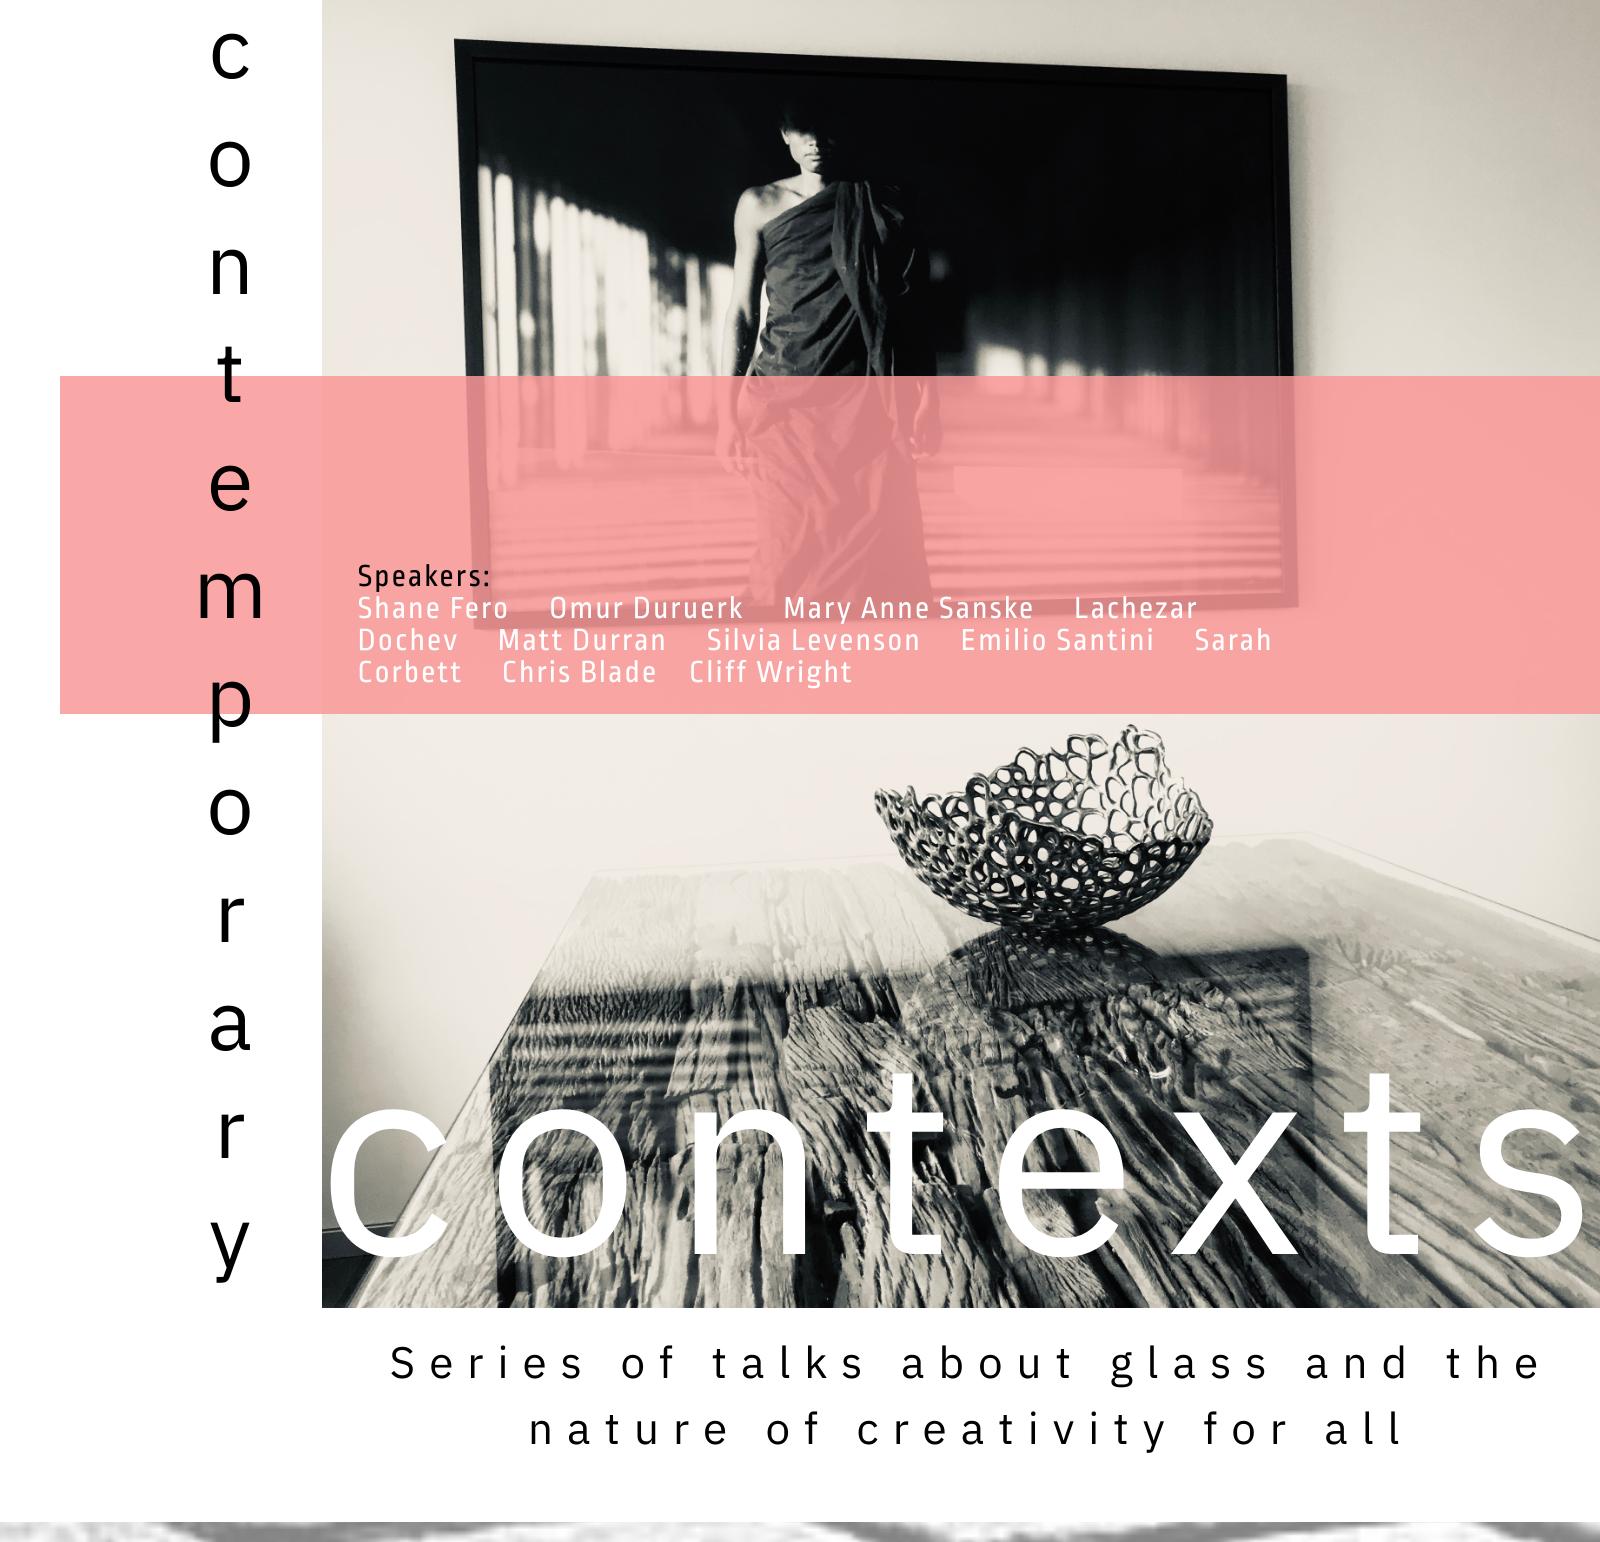 Contemporary Contexts Festival of Talks